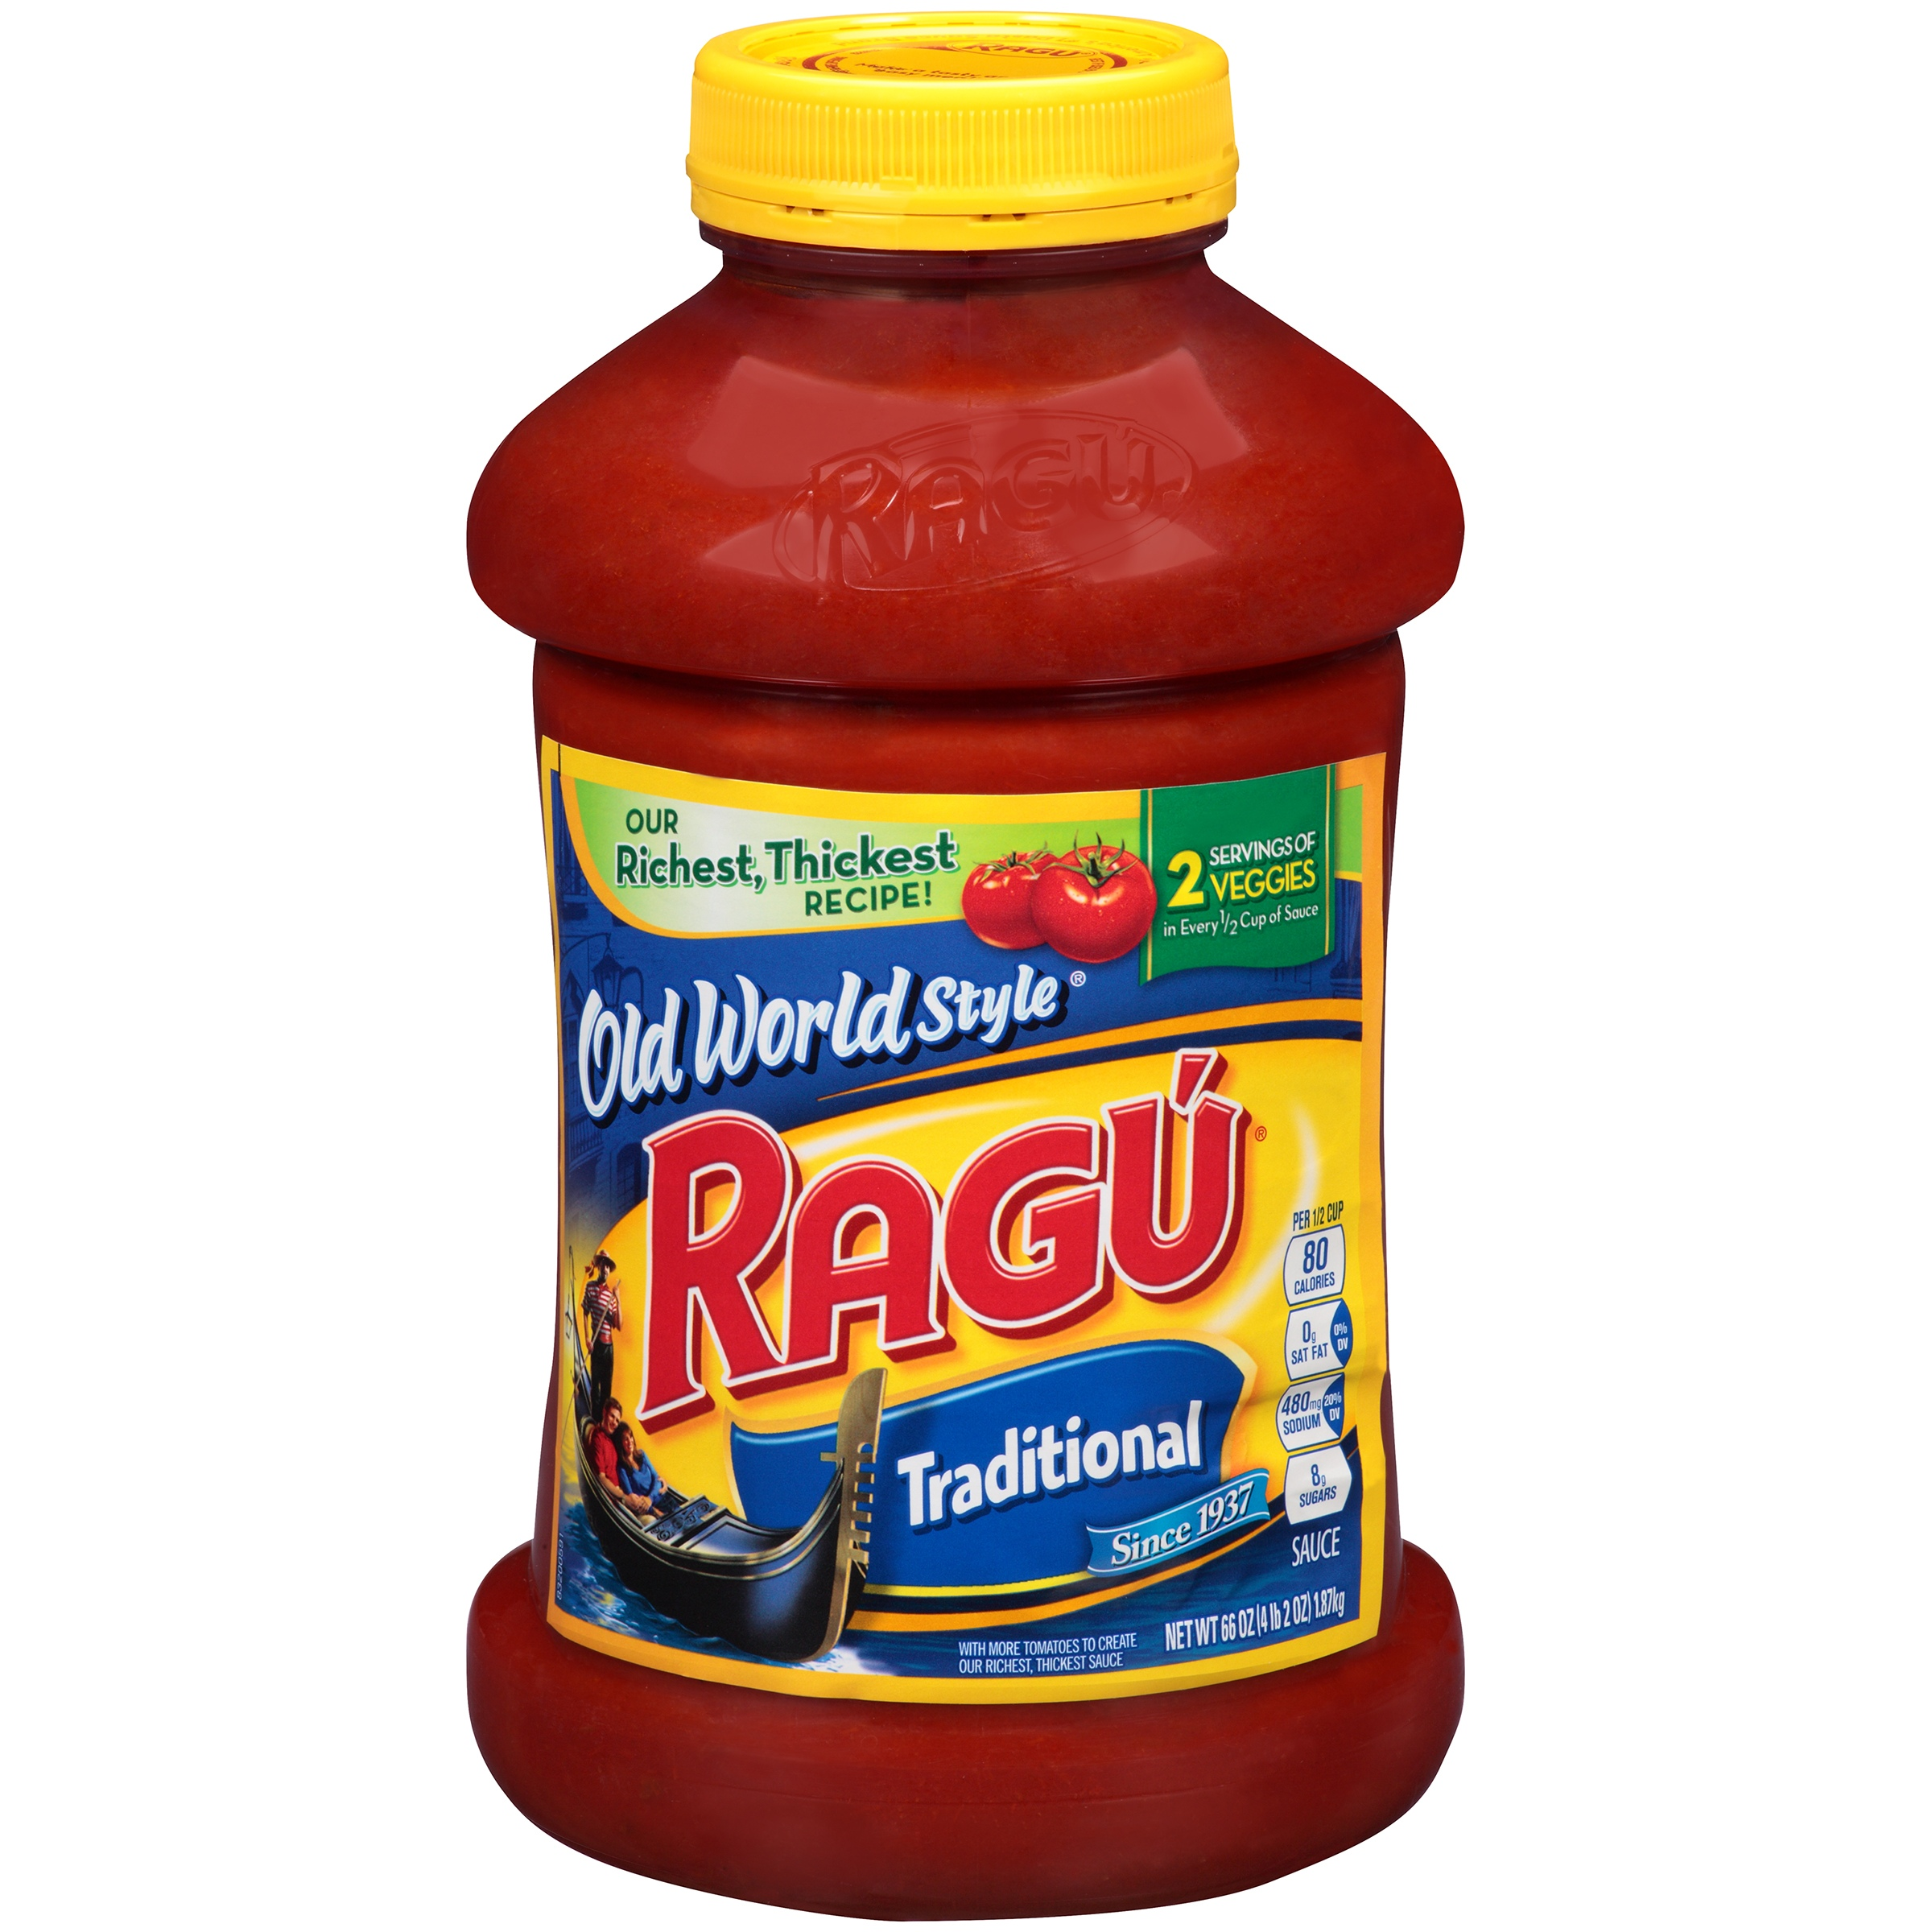 Ragú Old World Style Traditional Pasta Sauce 66 oz.